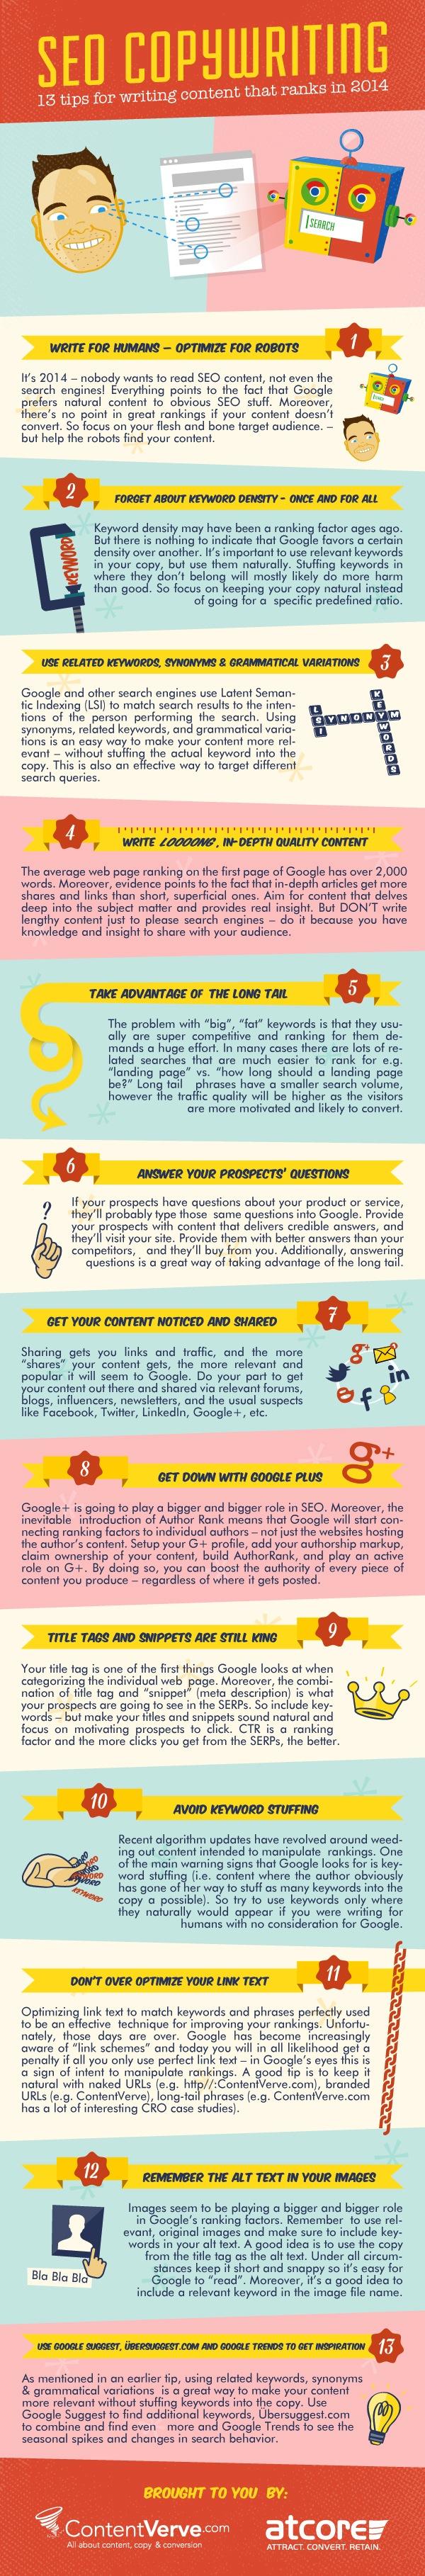 SEO-copywriting-How-to-write-content-that-ranks-20141